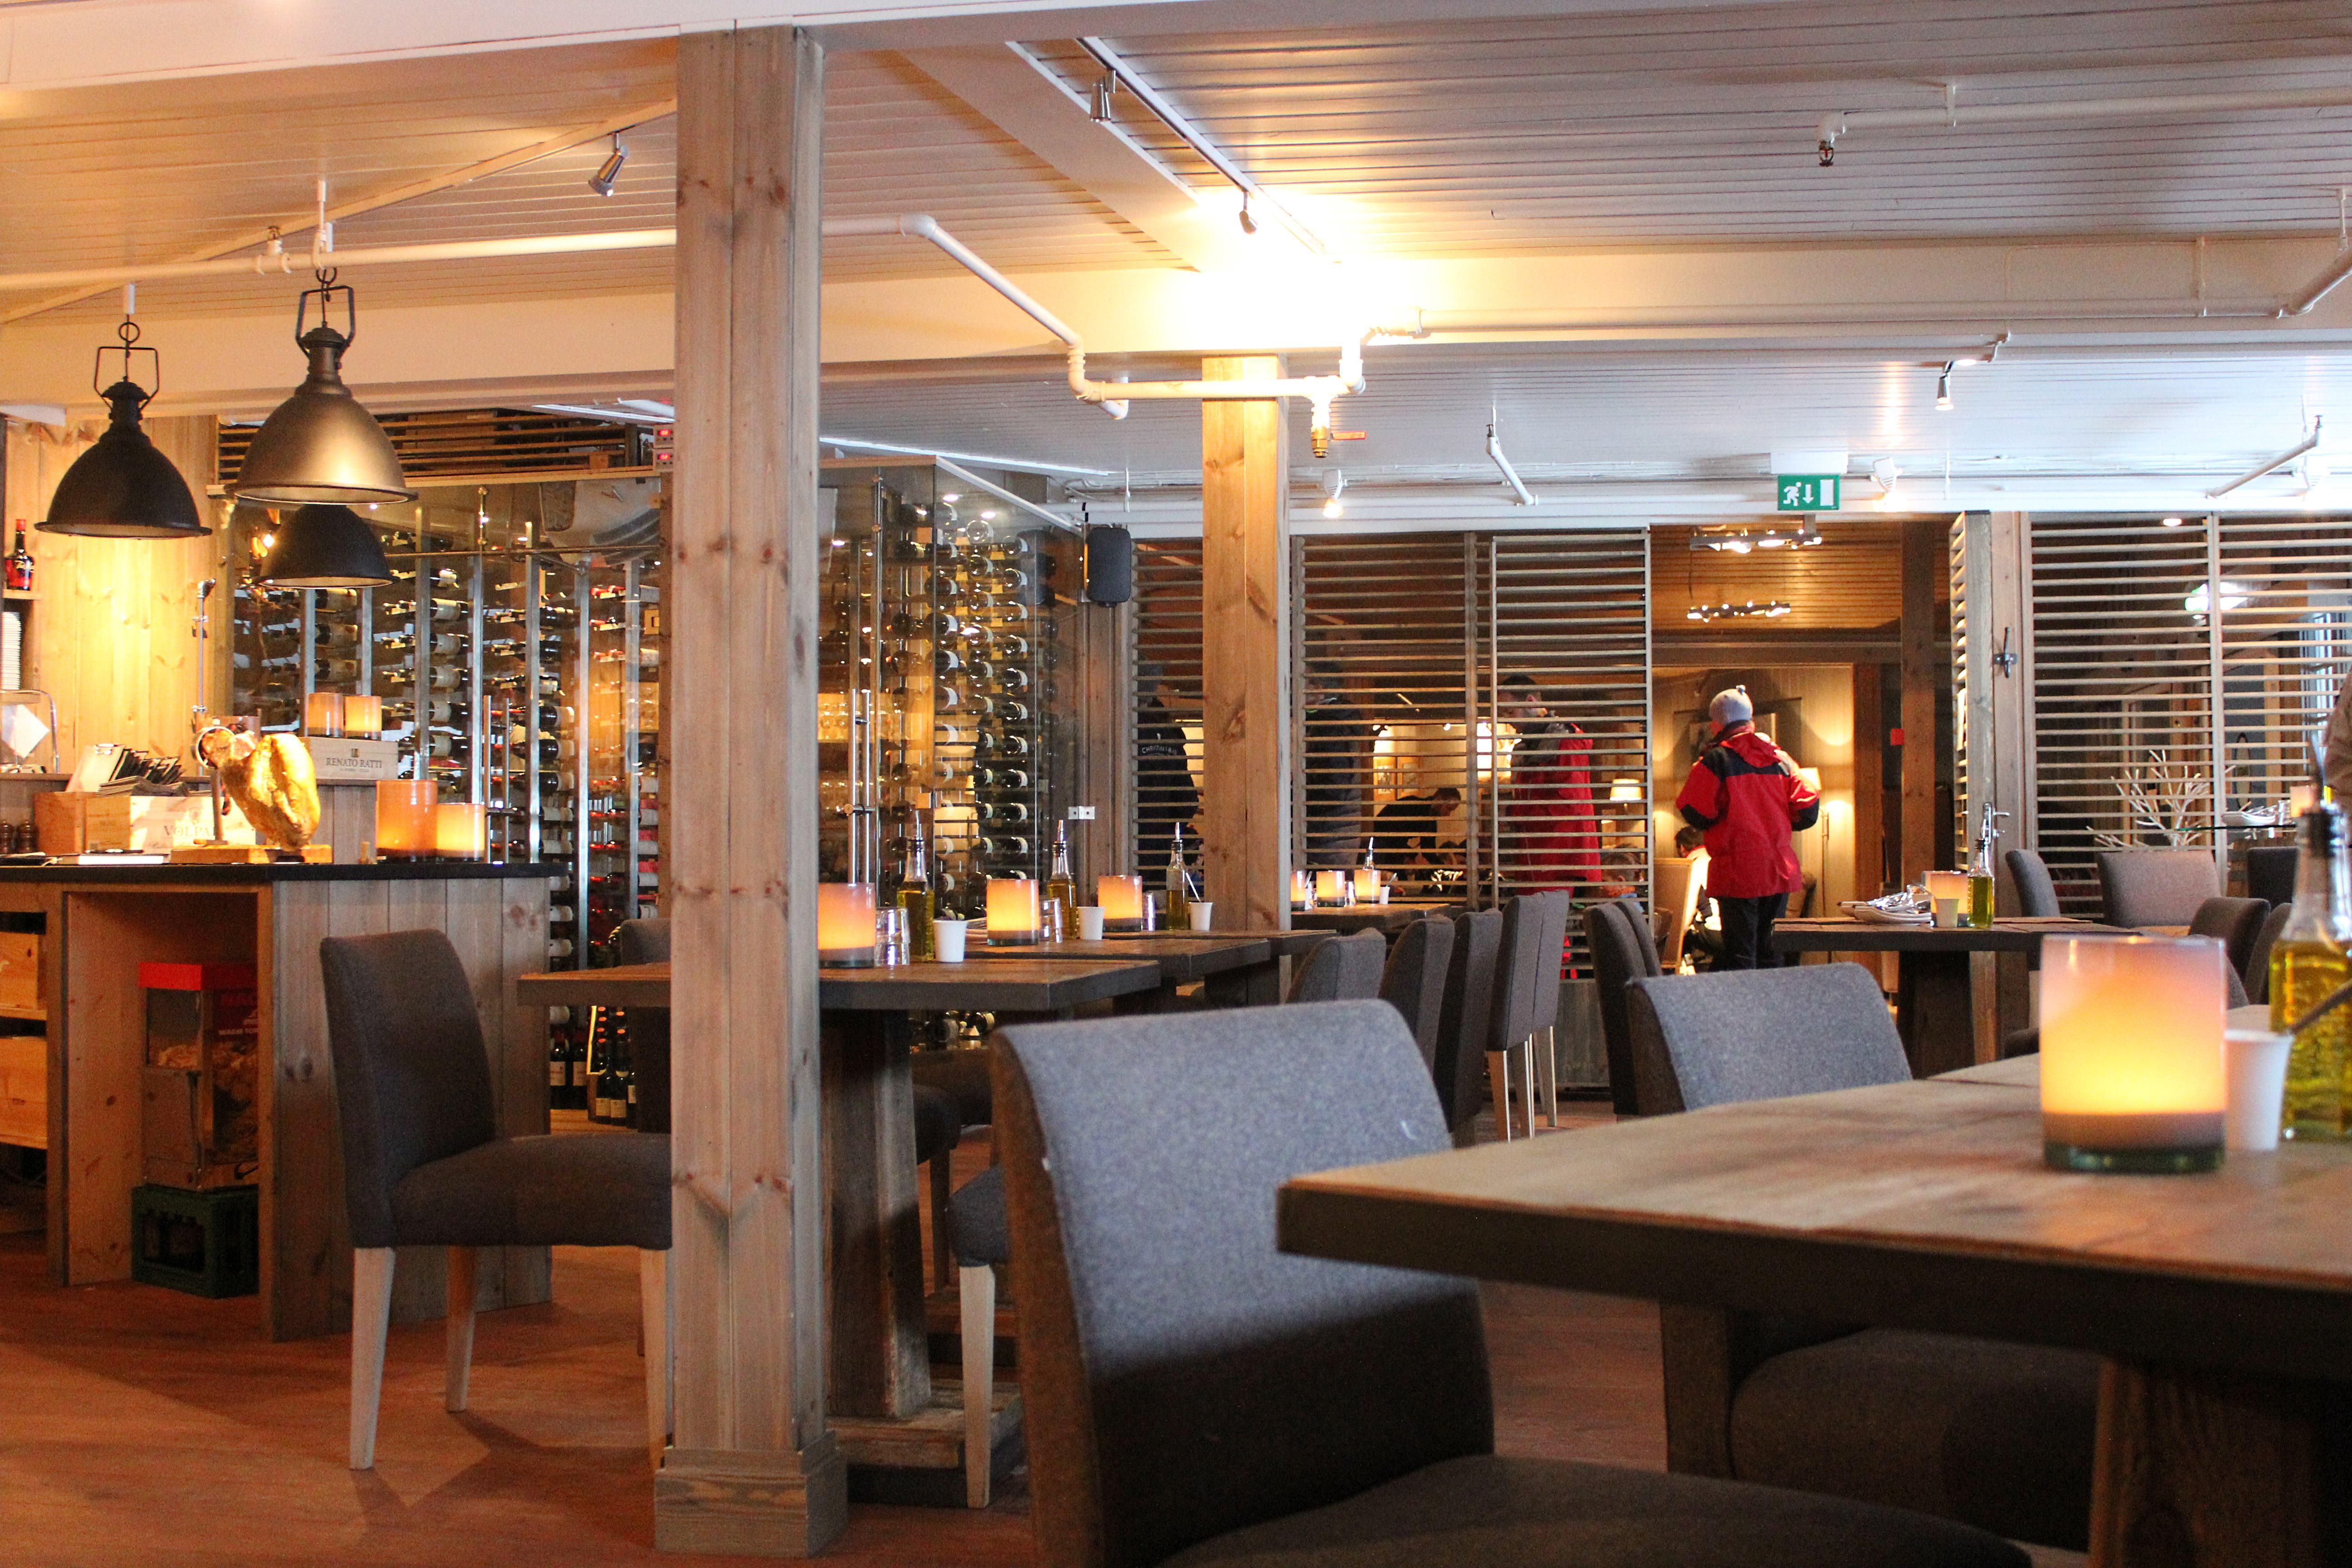 Gaiastova Restaurant